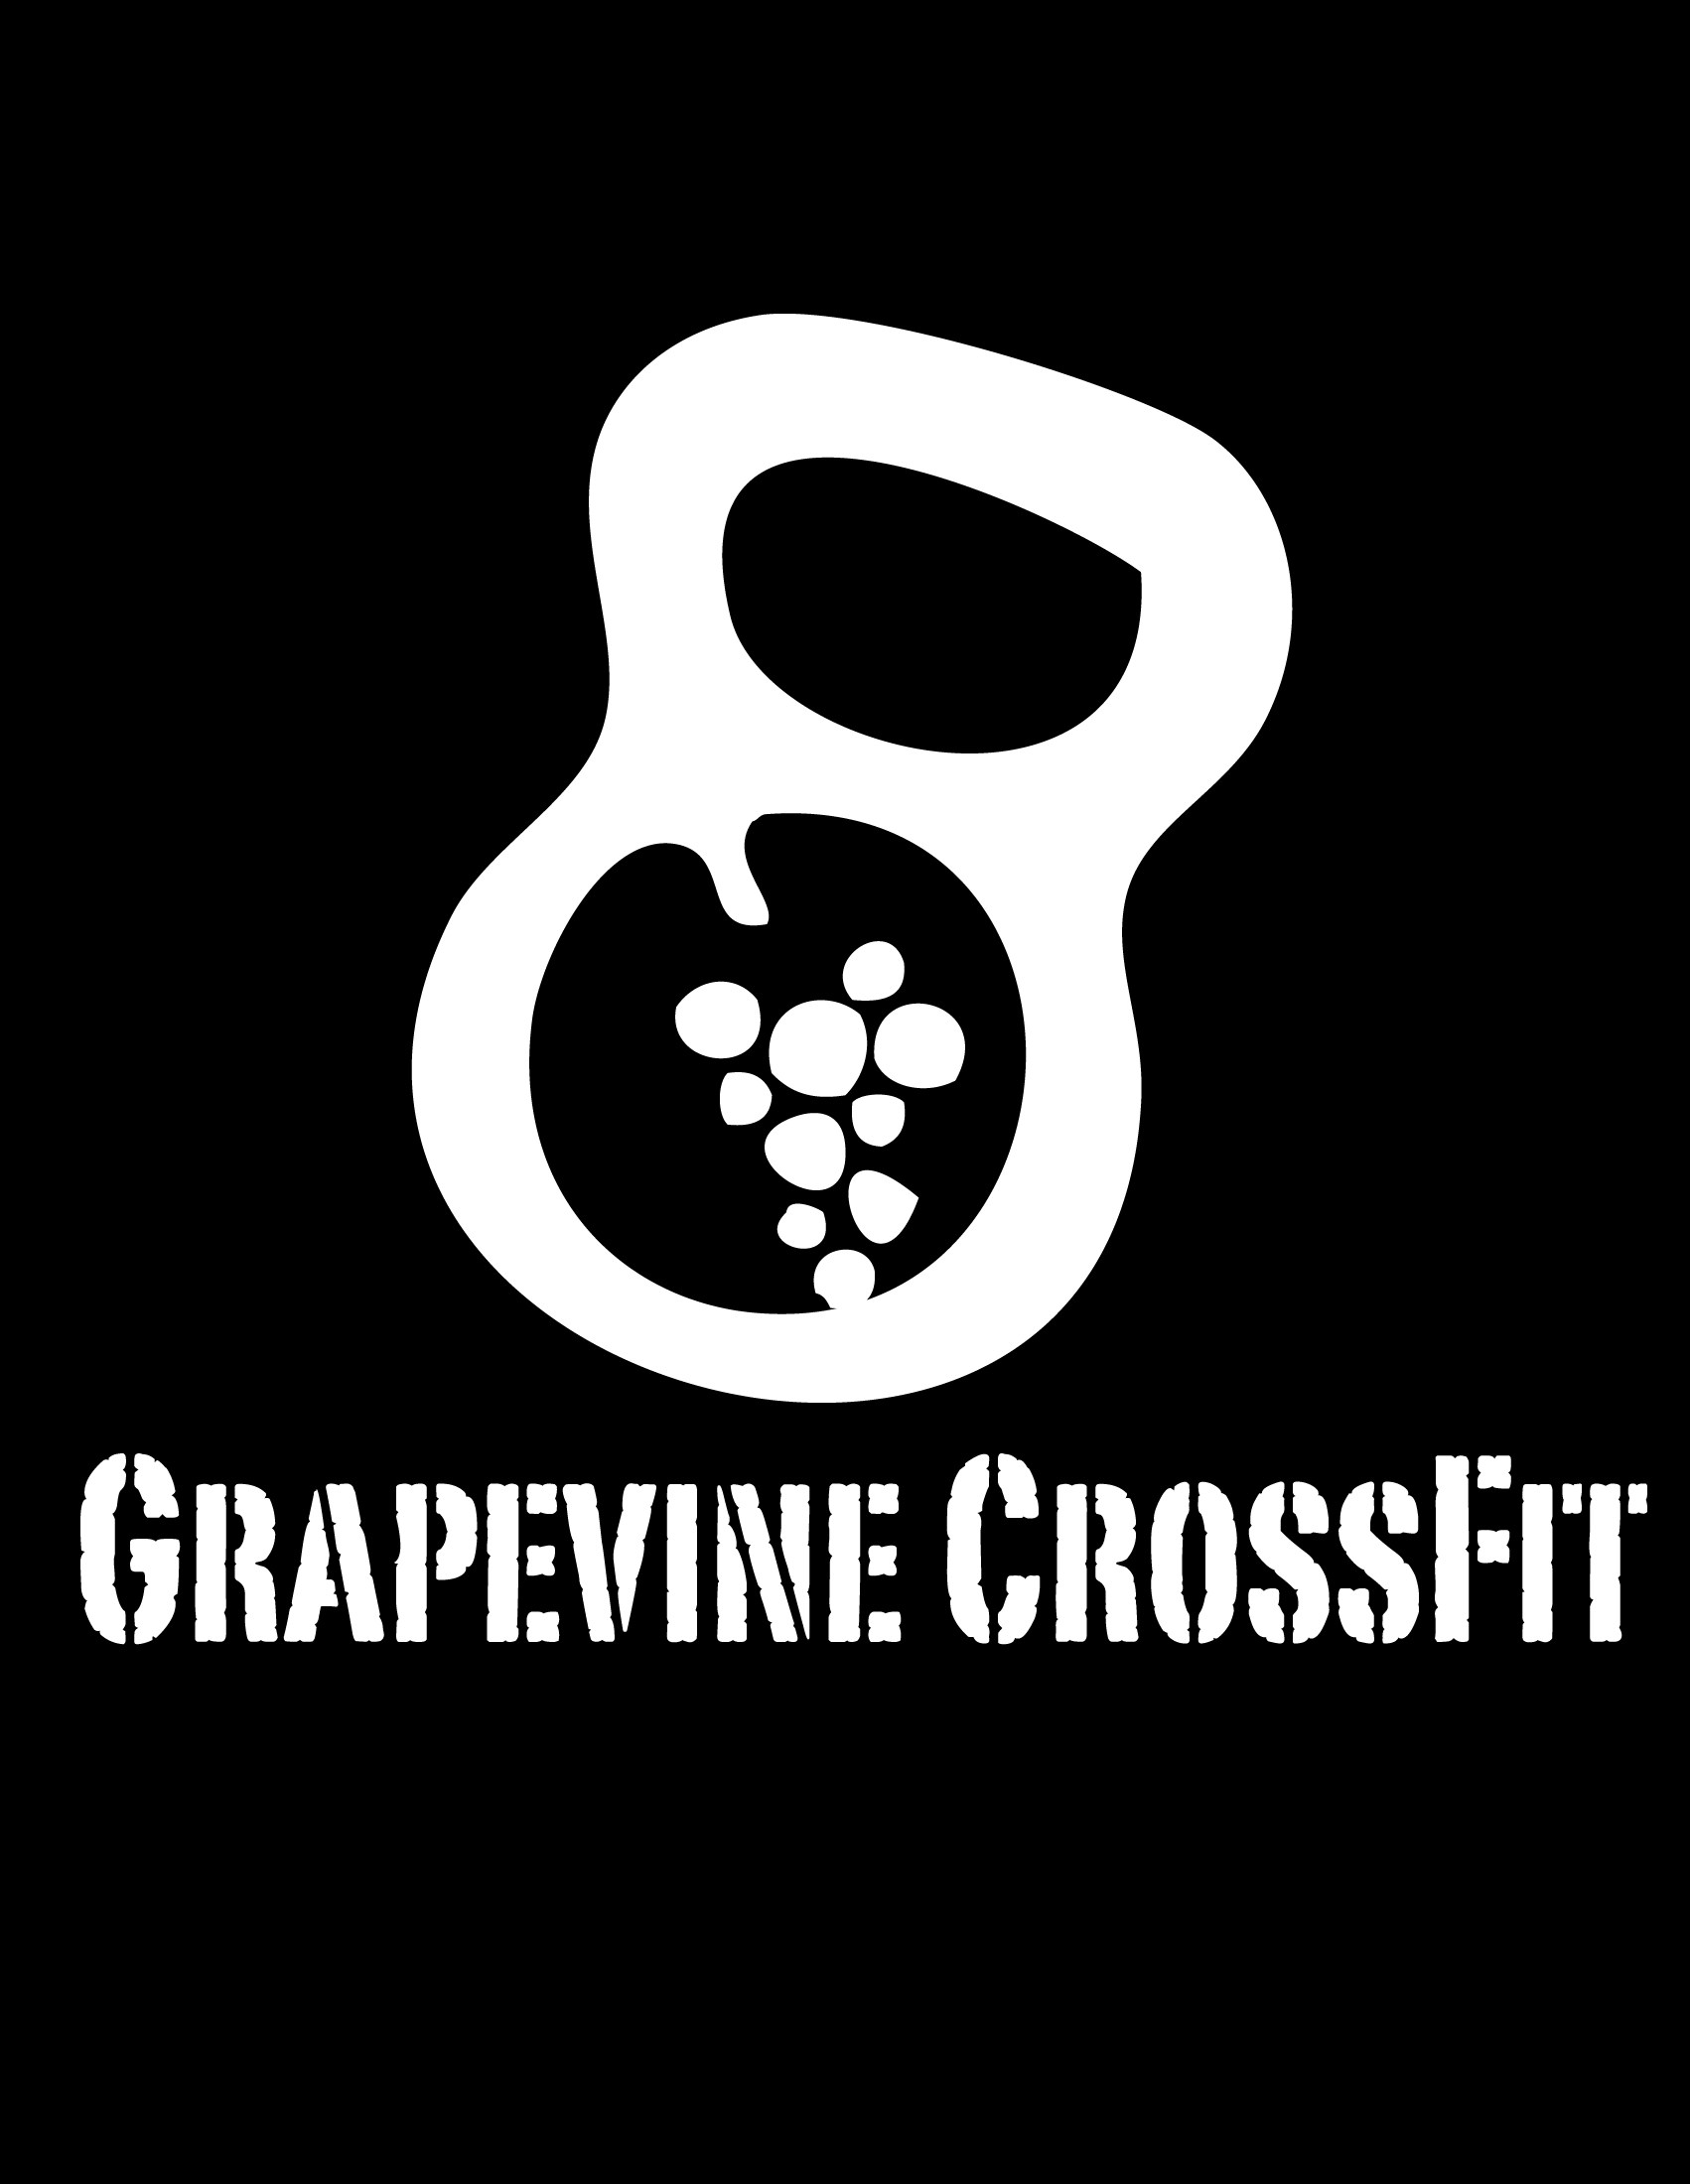 Grapevine CrossFit logo